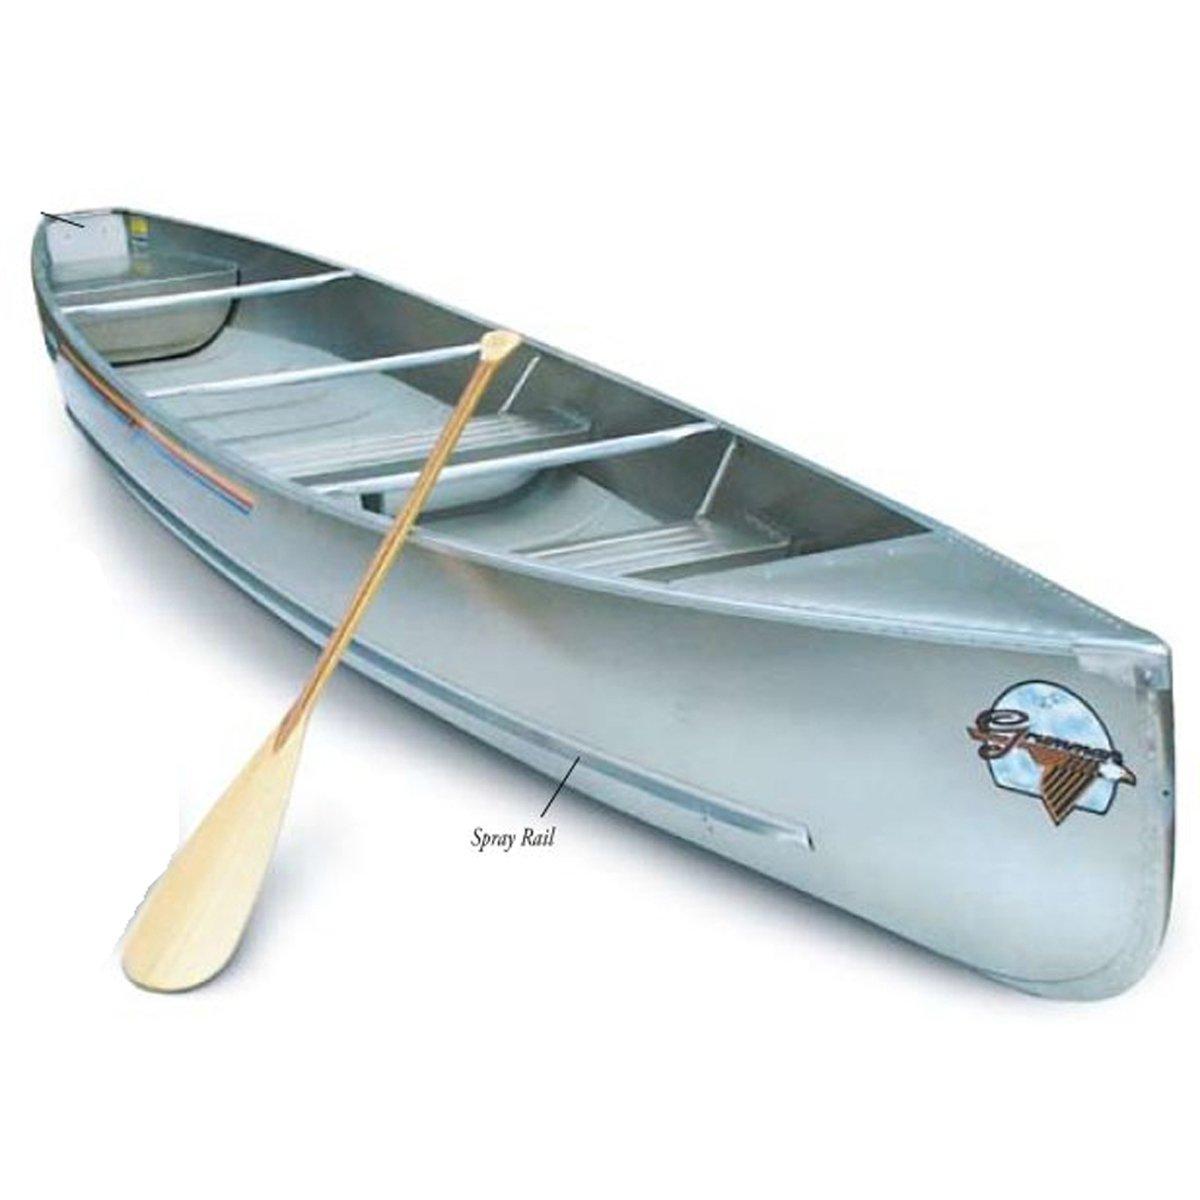 Grumman 16' Square Stern .050 Canoe - Natural Aluminum Finish